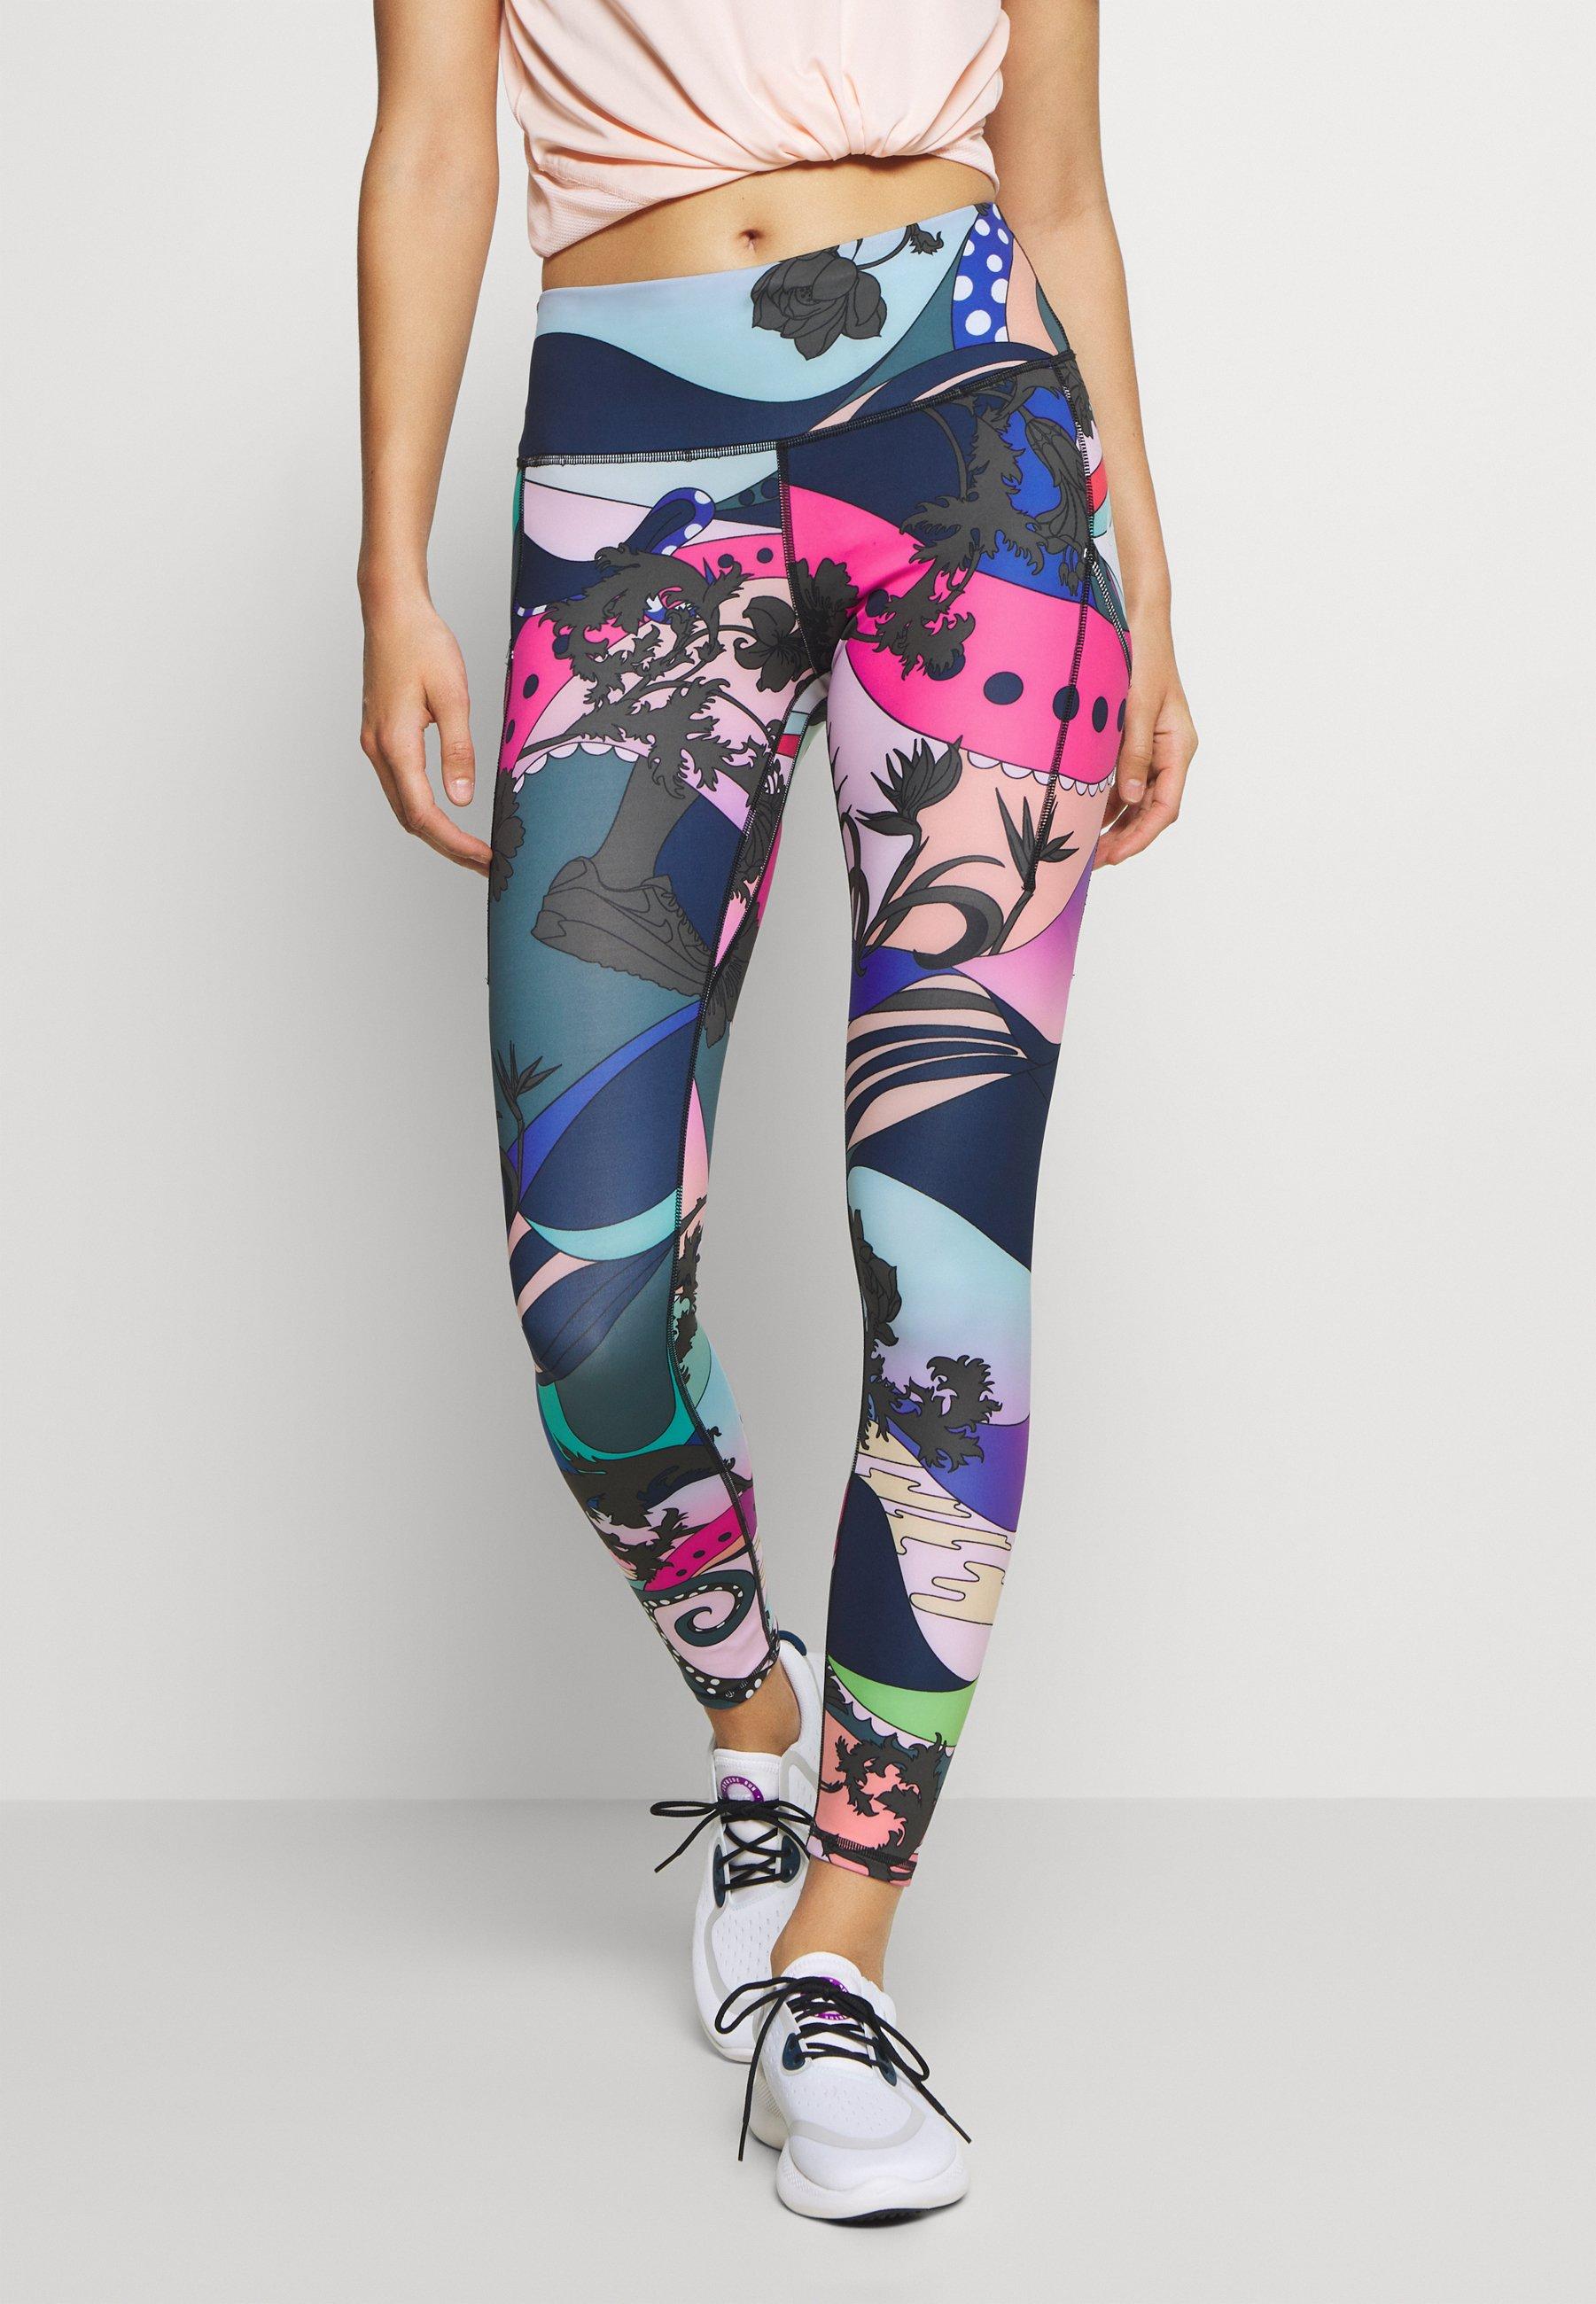 For Cheap Popular Women's Clothing Nike Performance EPIC LUX Leggings hyper pink/black/white dURBrZpjN VV5s63x0p